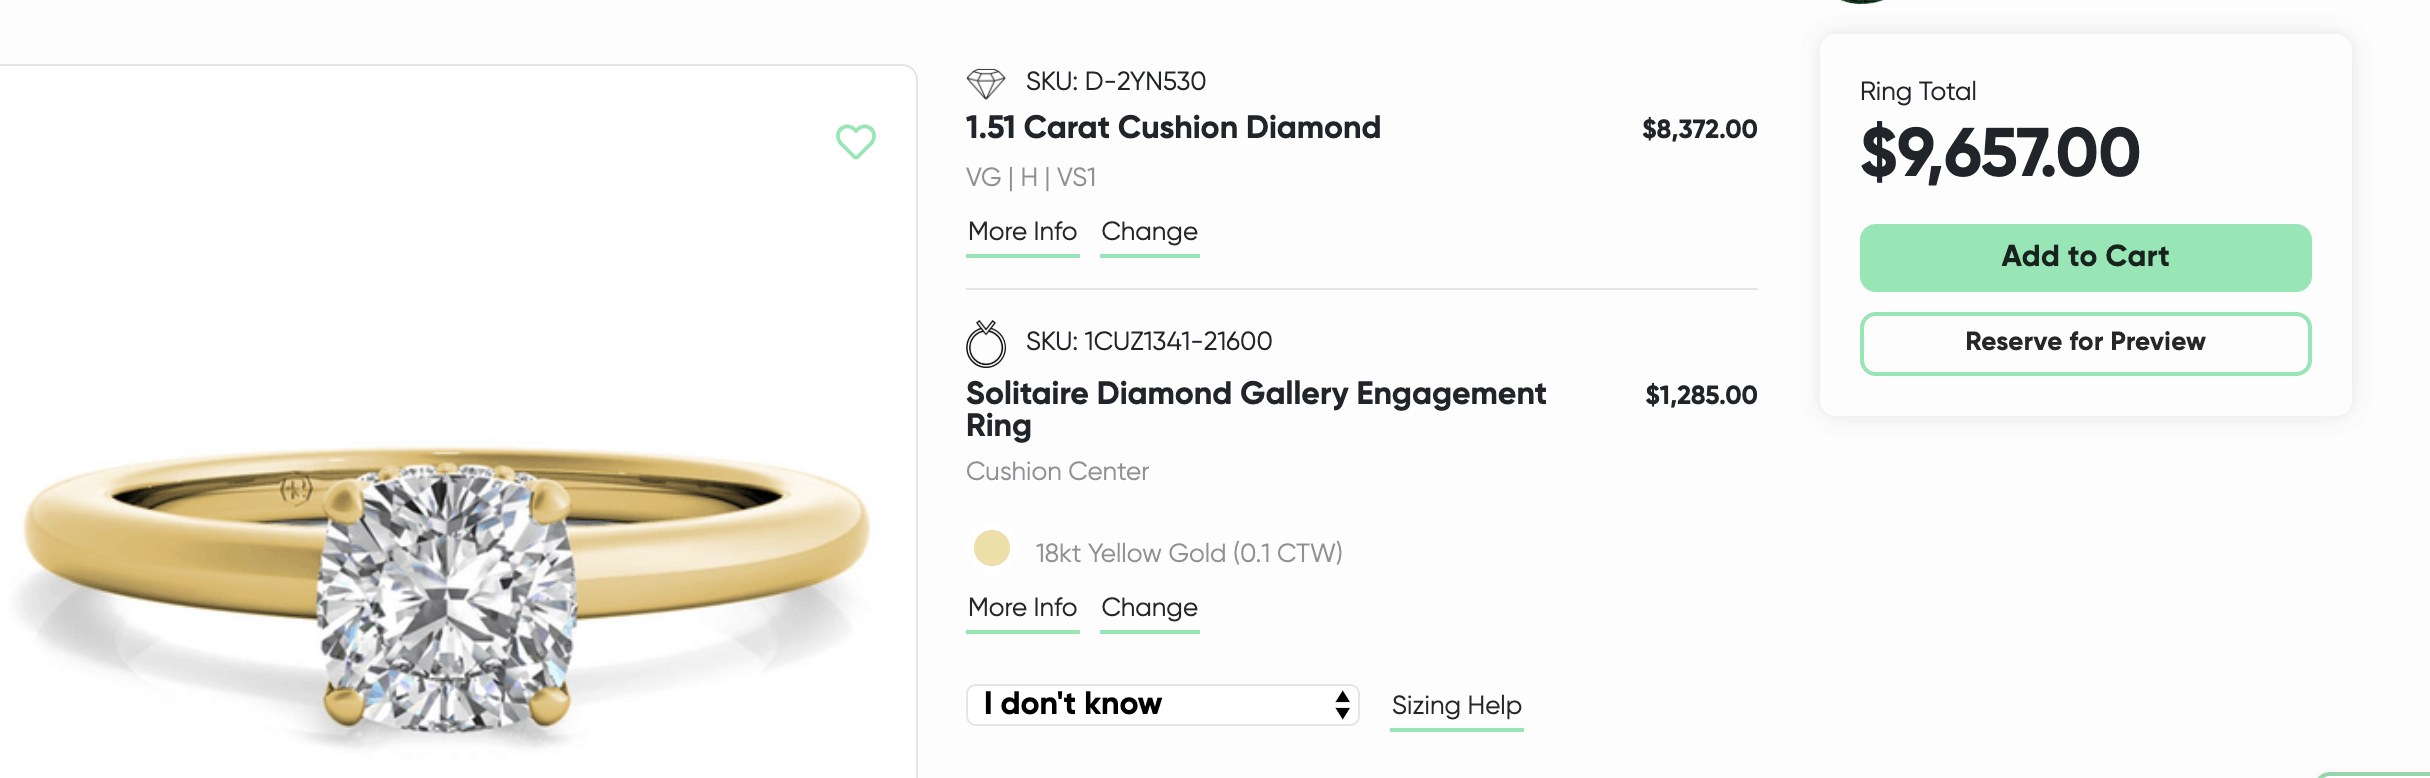 Ritani gold ring